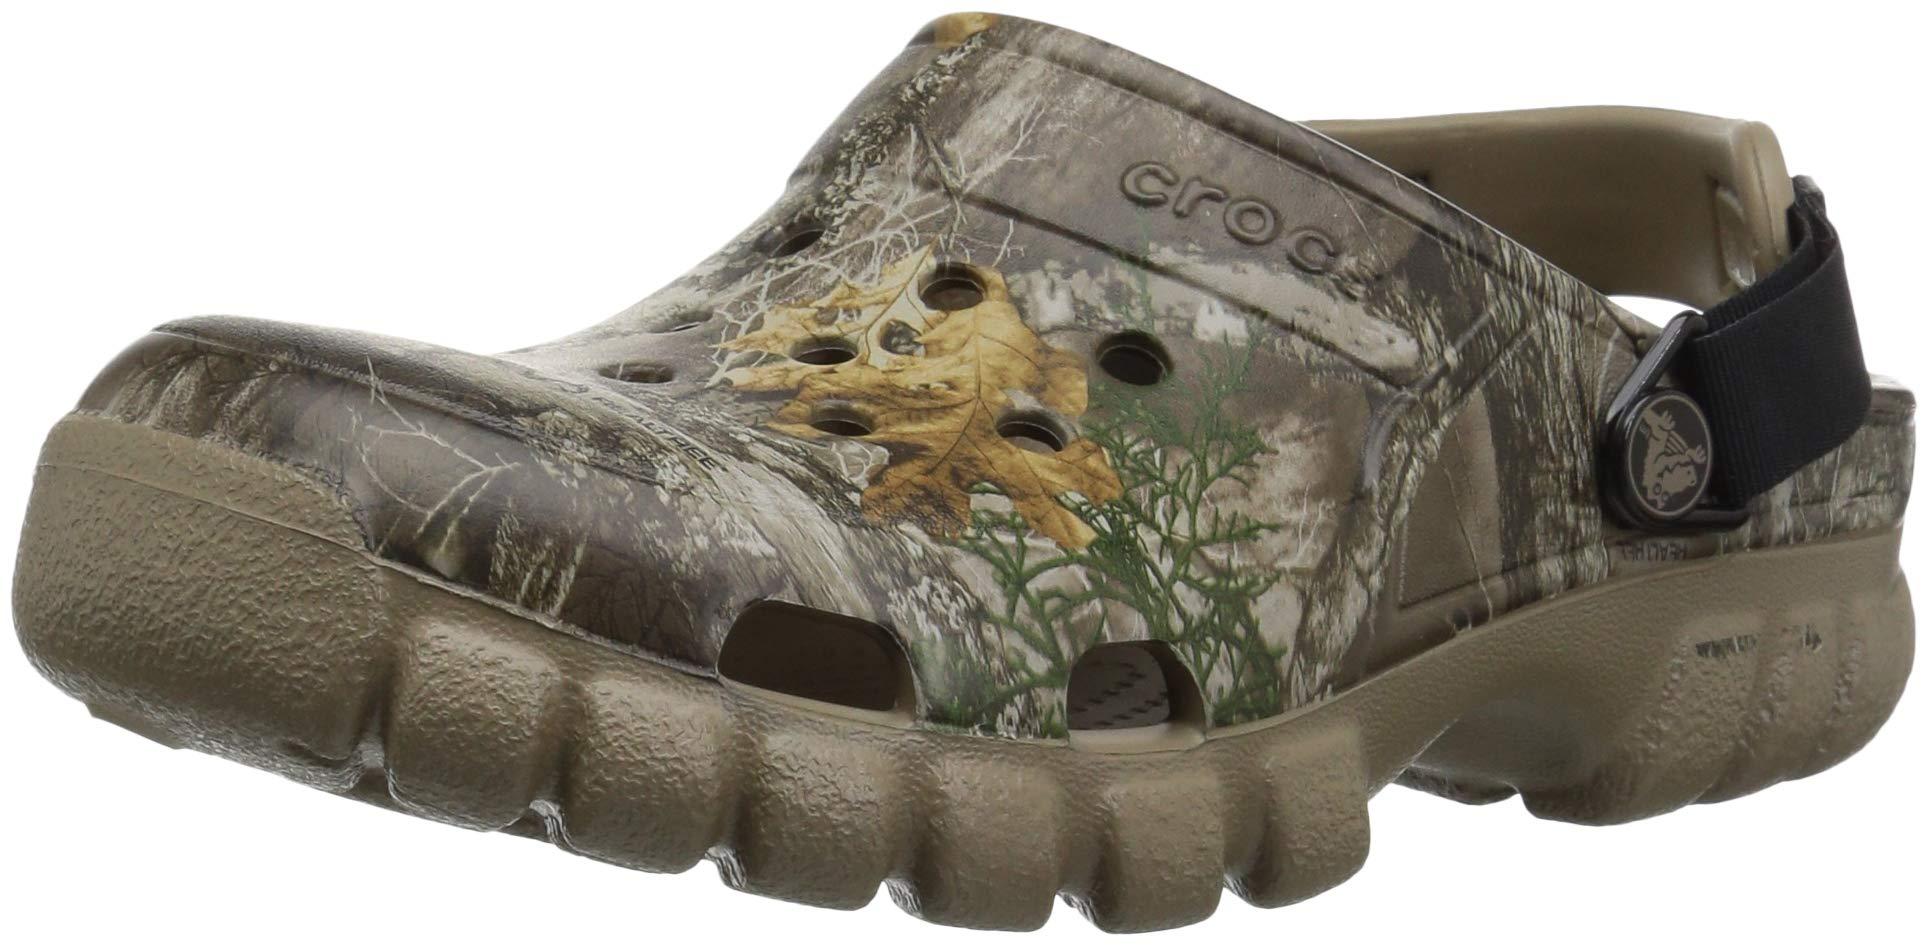 Crocs Offroad Sport Realtree Edge Clog, Khaki, 4 US Men/ 6 US Women M US